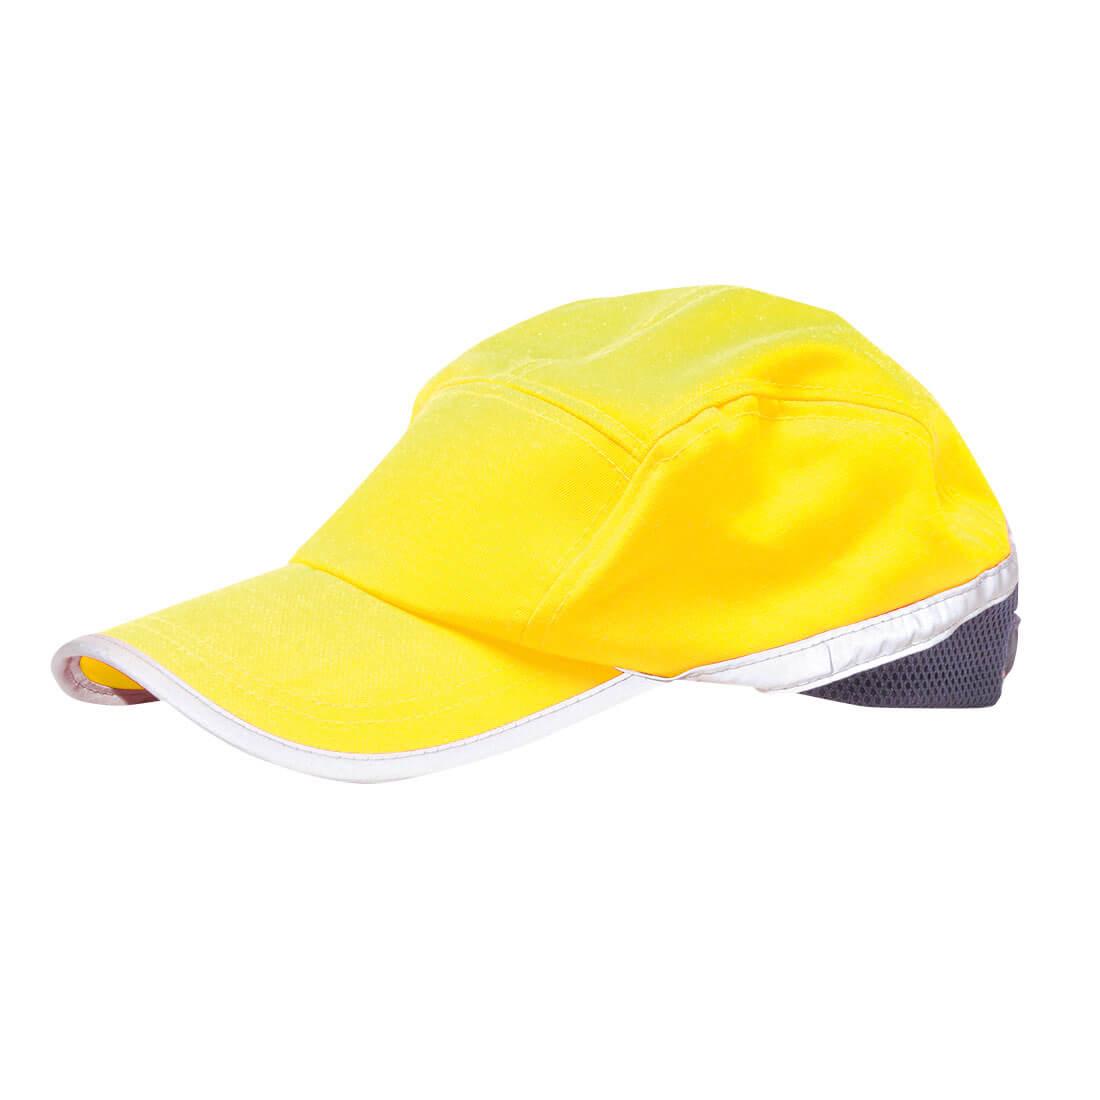 Image of Portwest Hi Vis Baseball Cap Yellow / Navy One Size